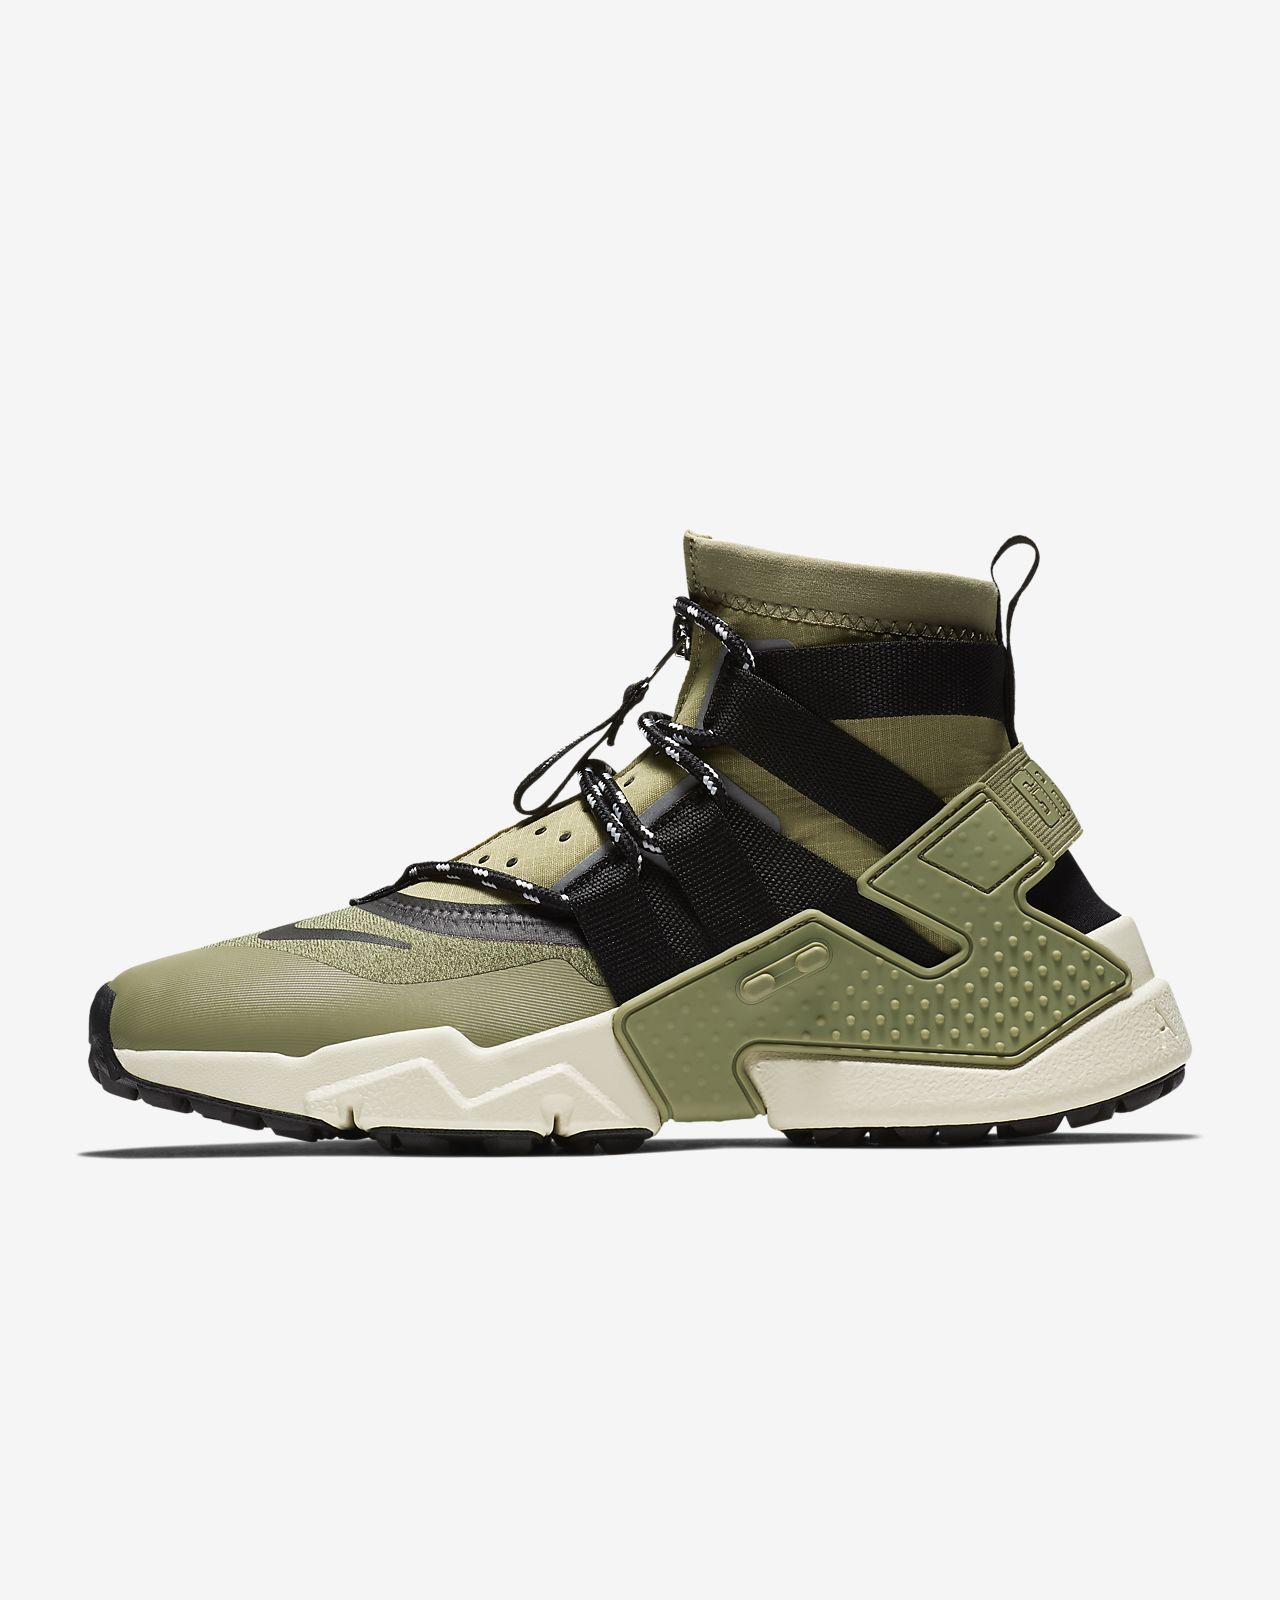 quality design 8d55a 4484e Nike Air Huarache Gripp Men s Shoe